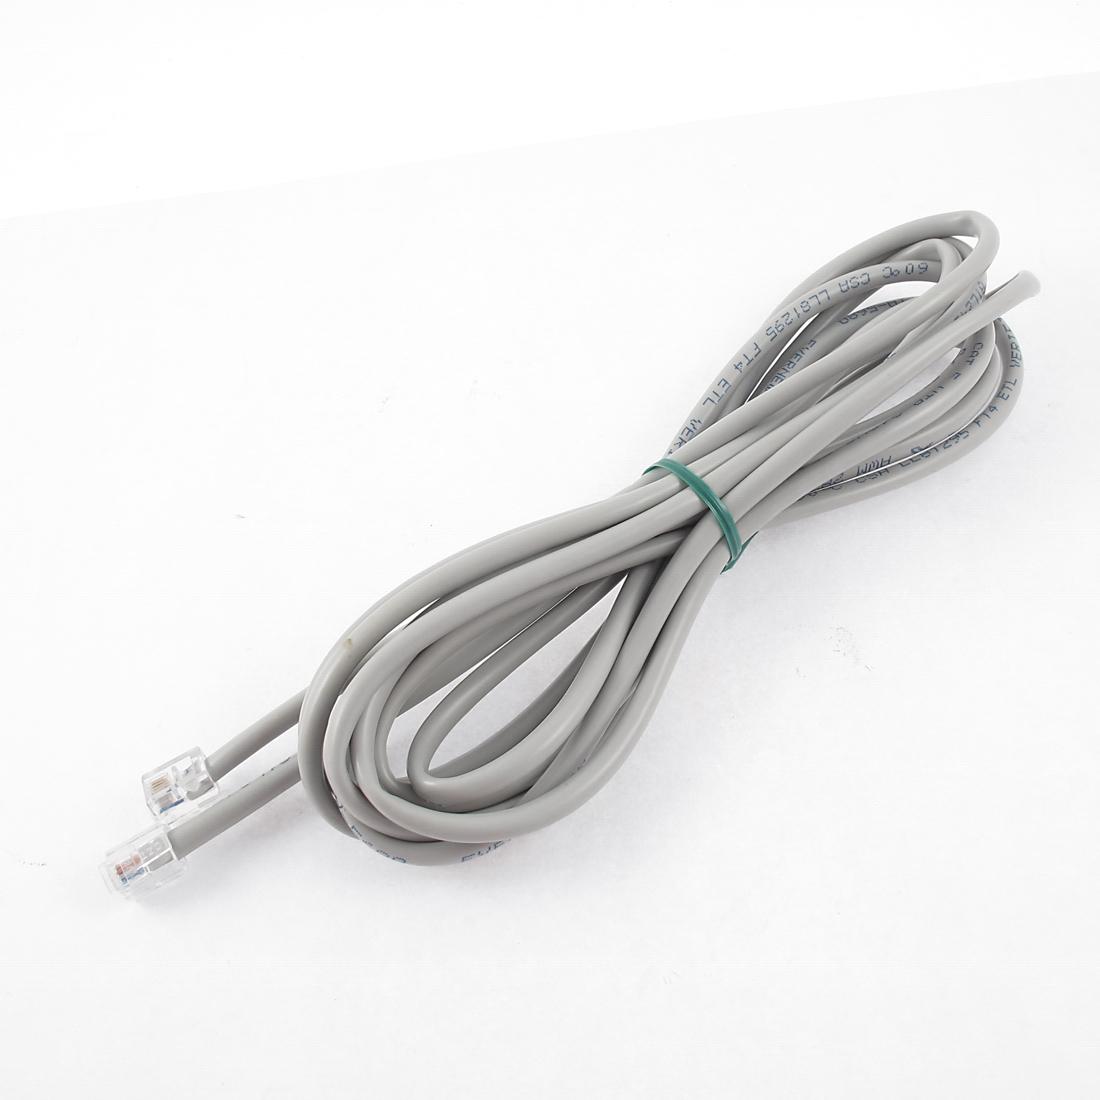 9.8Ft Length 6P4C RJ11 Telephone Extension Fax Modem Cable Line Gray